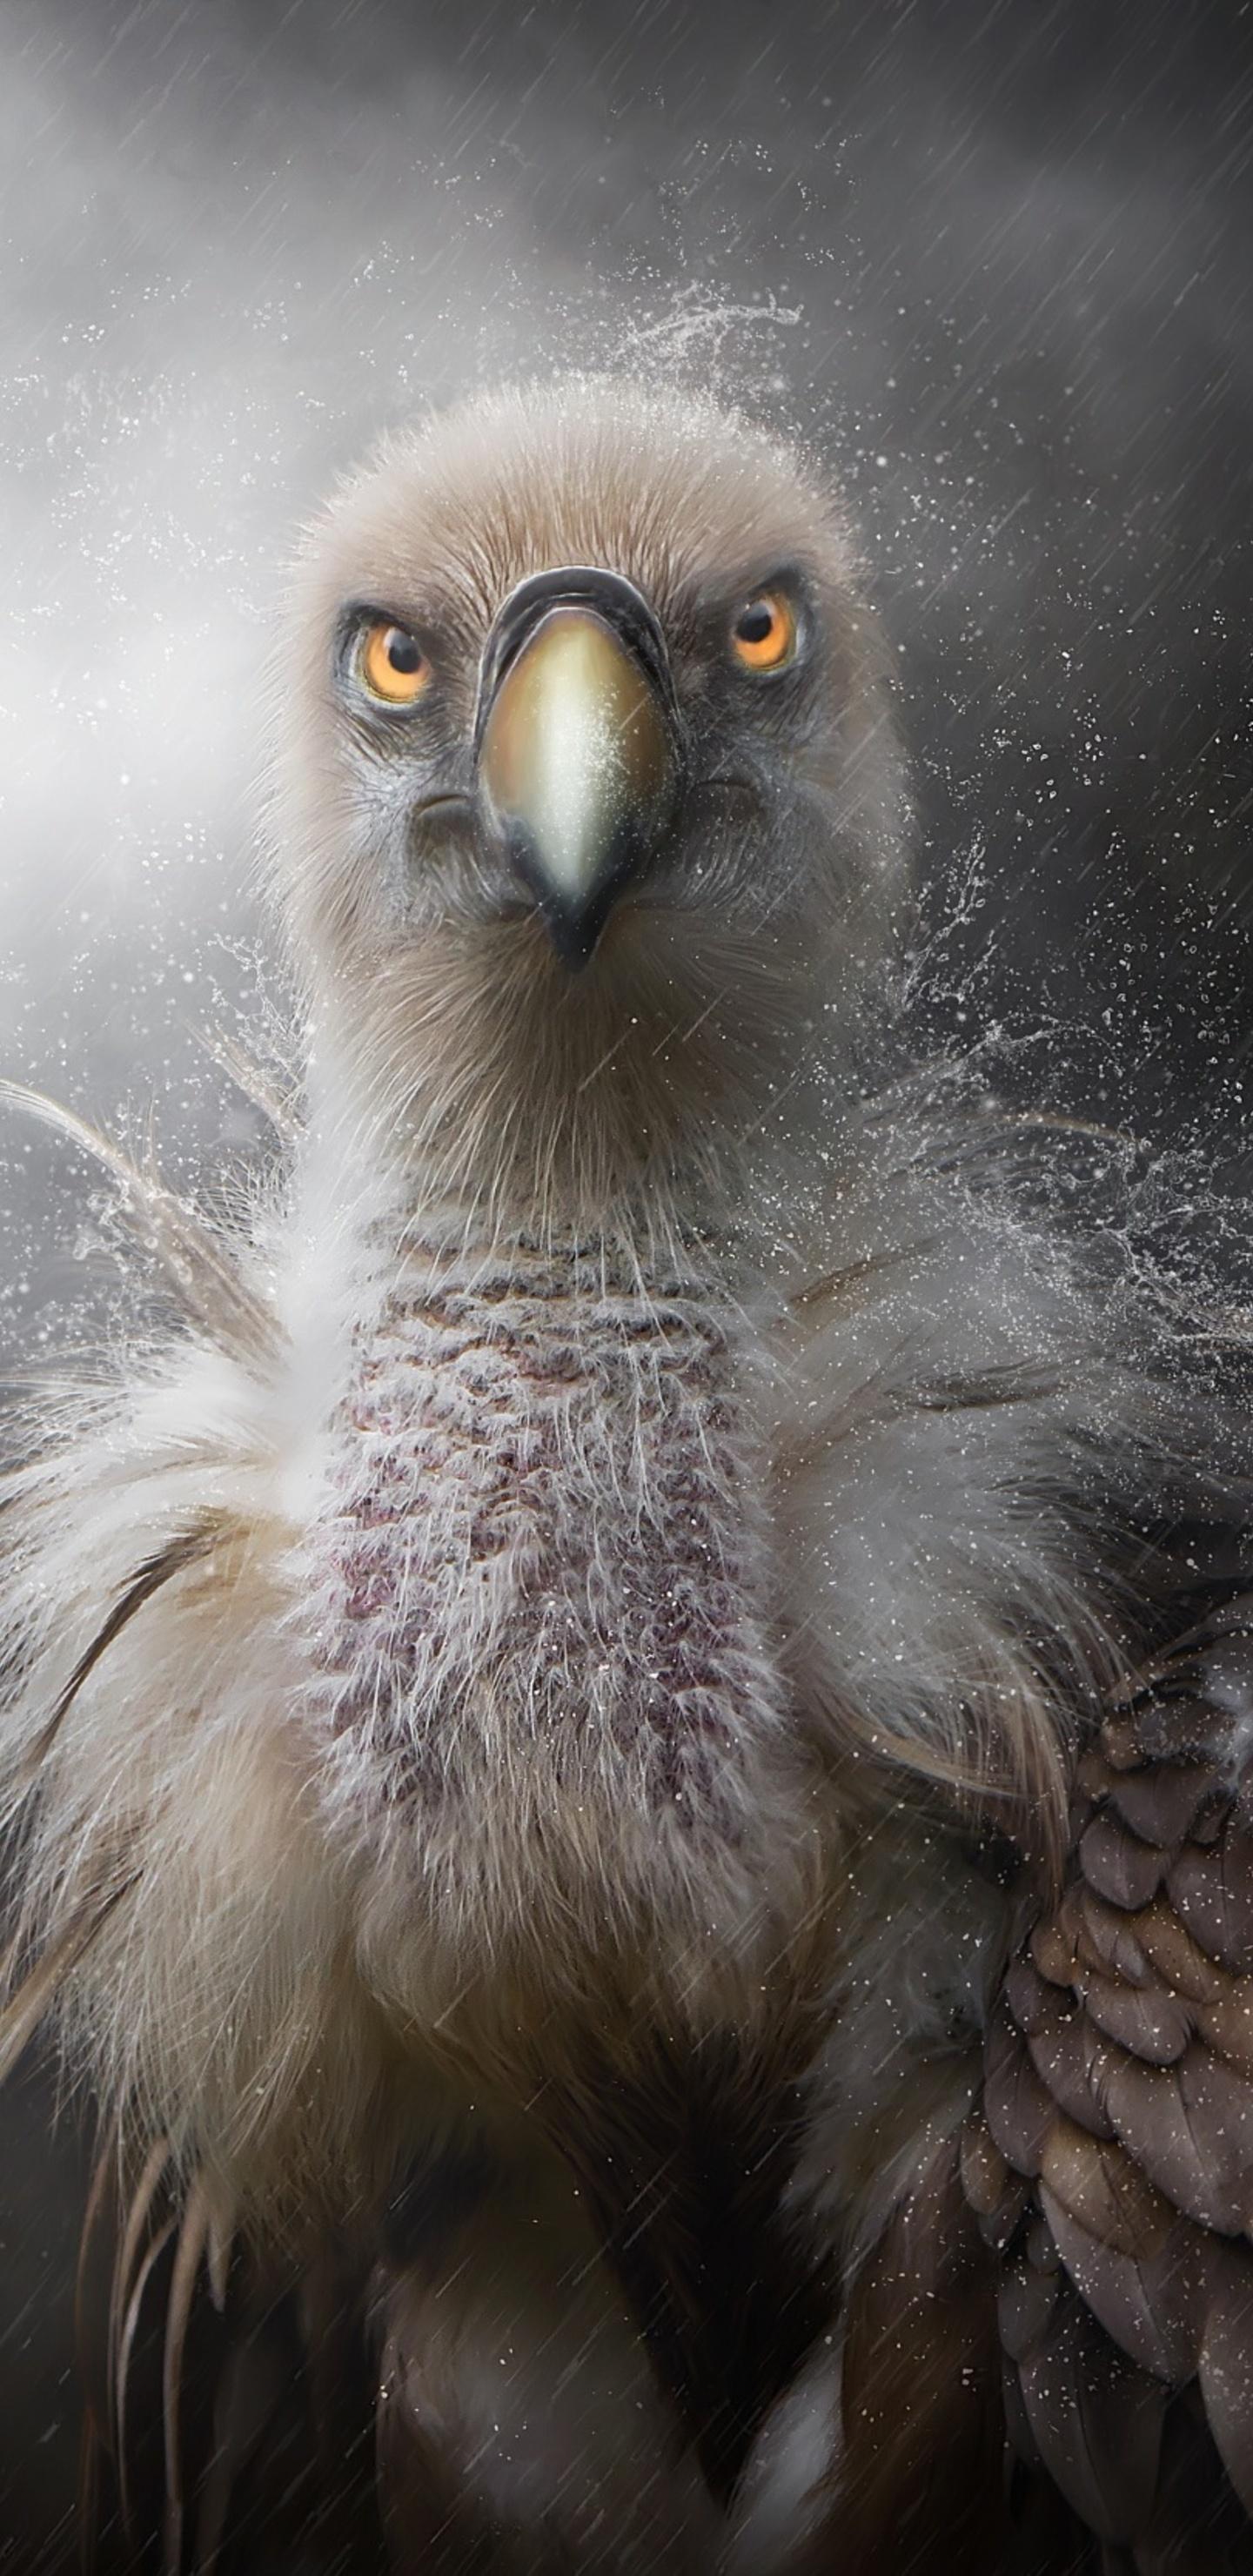 eagle-in-rain-50.jpg